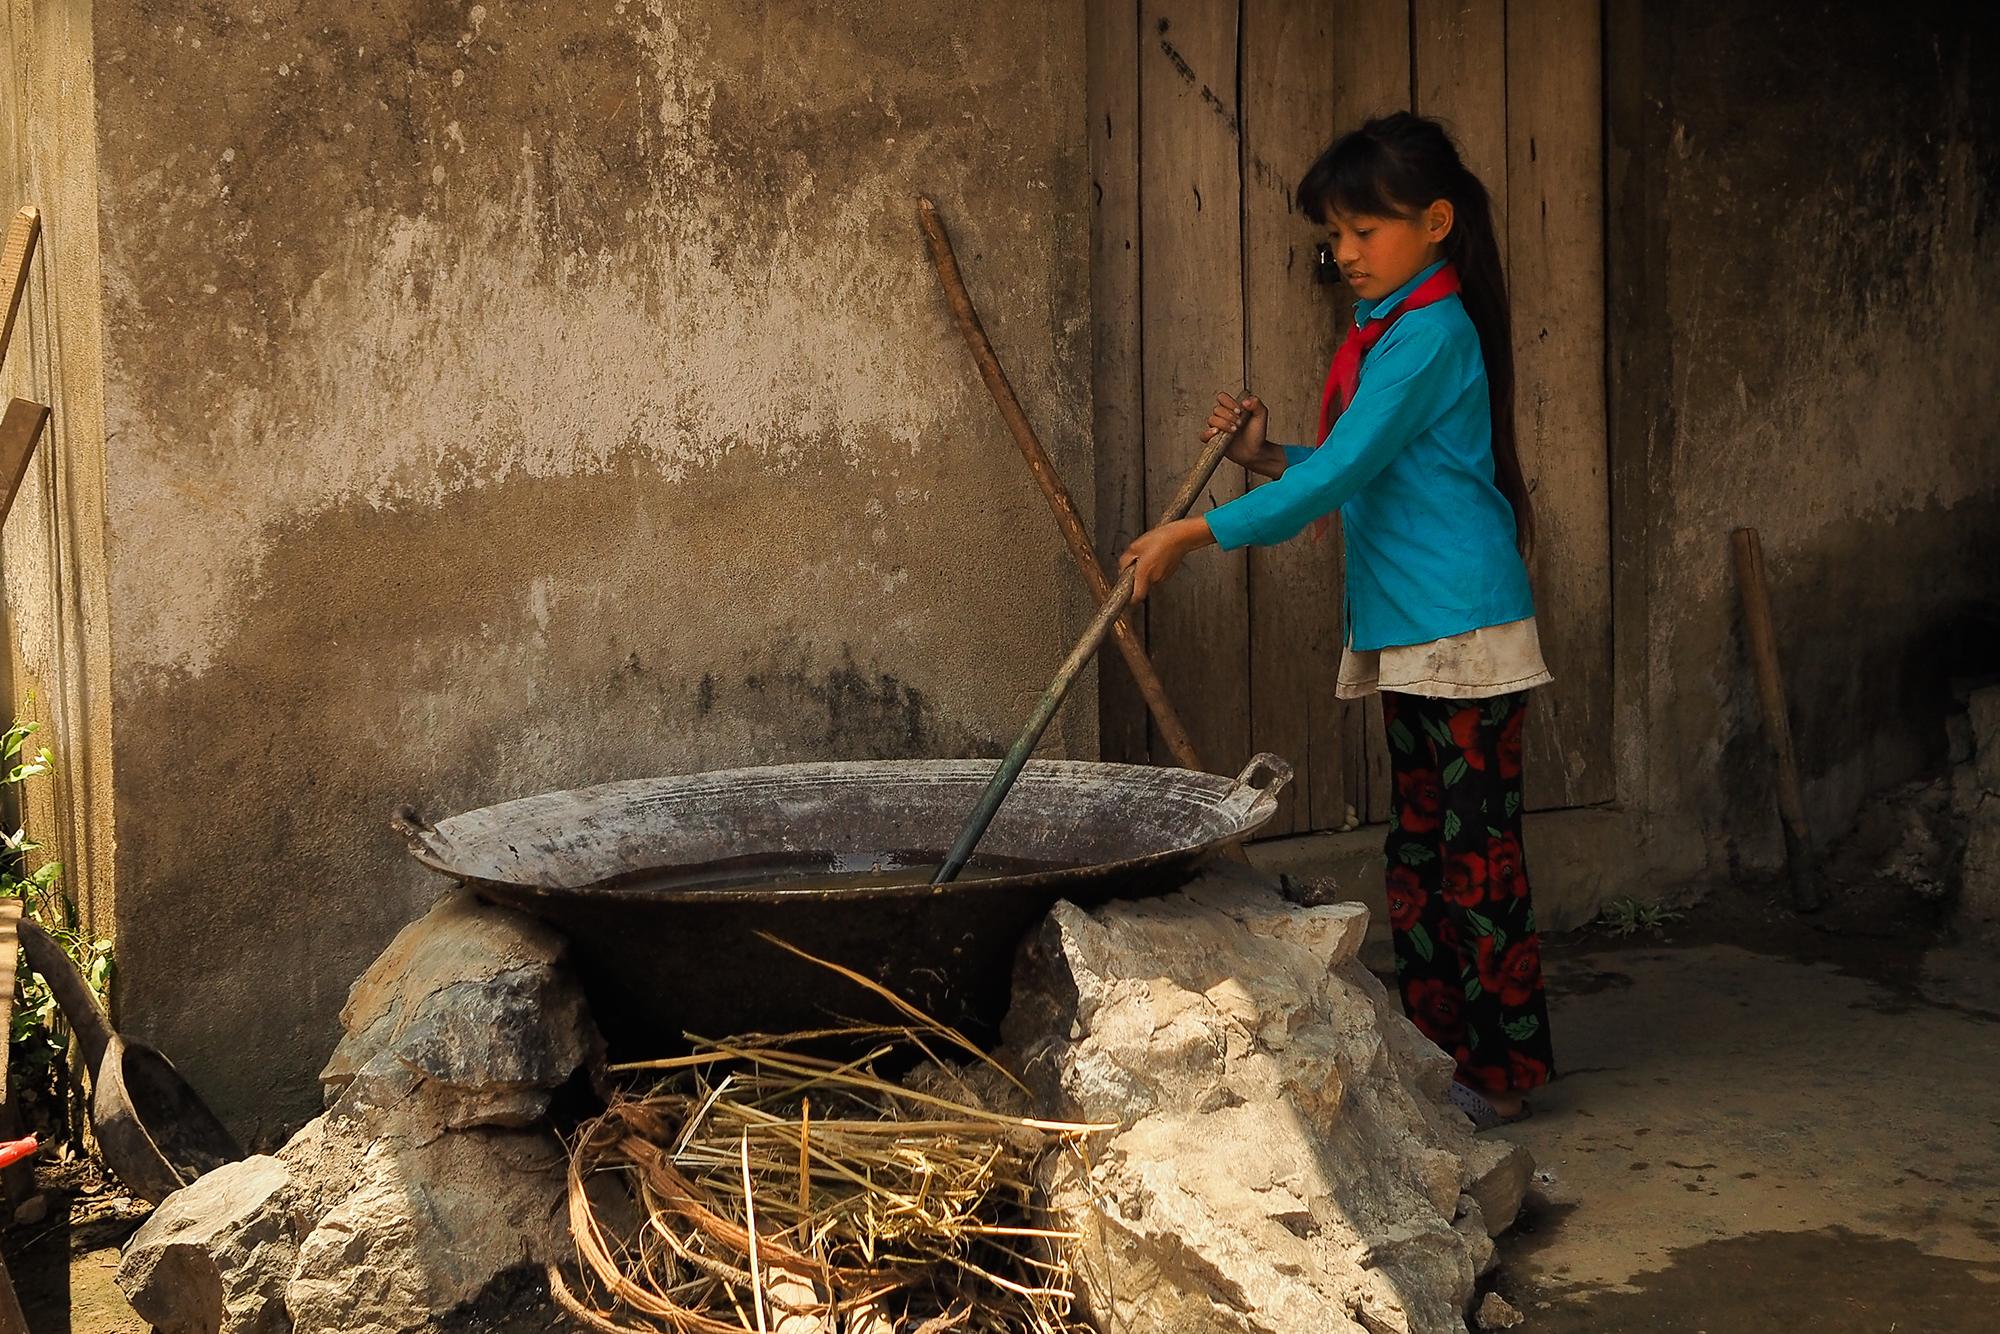 Teinture de la fibre de lin au vietnam